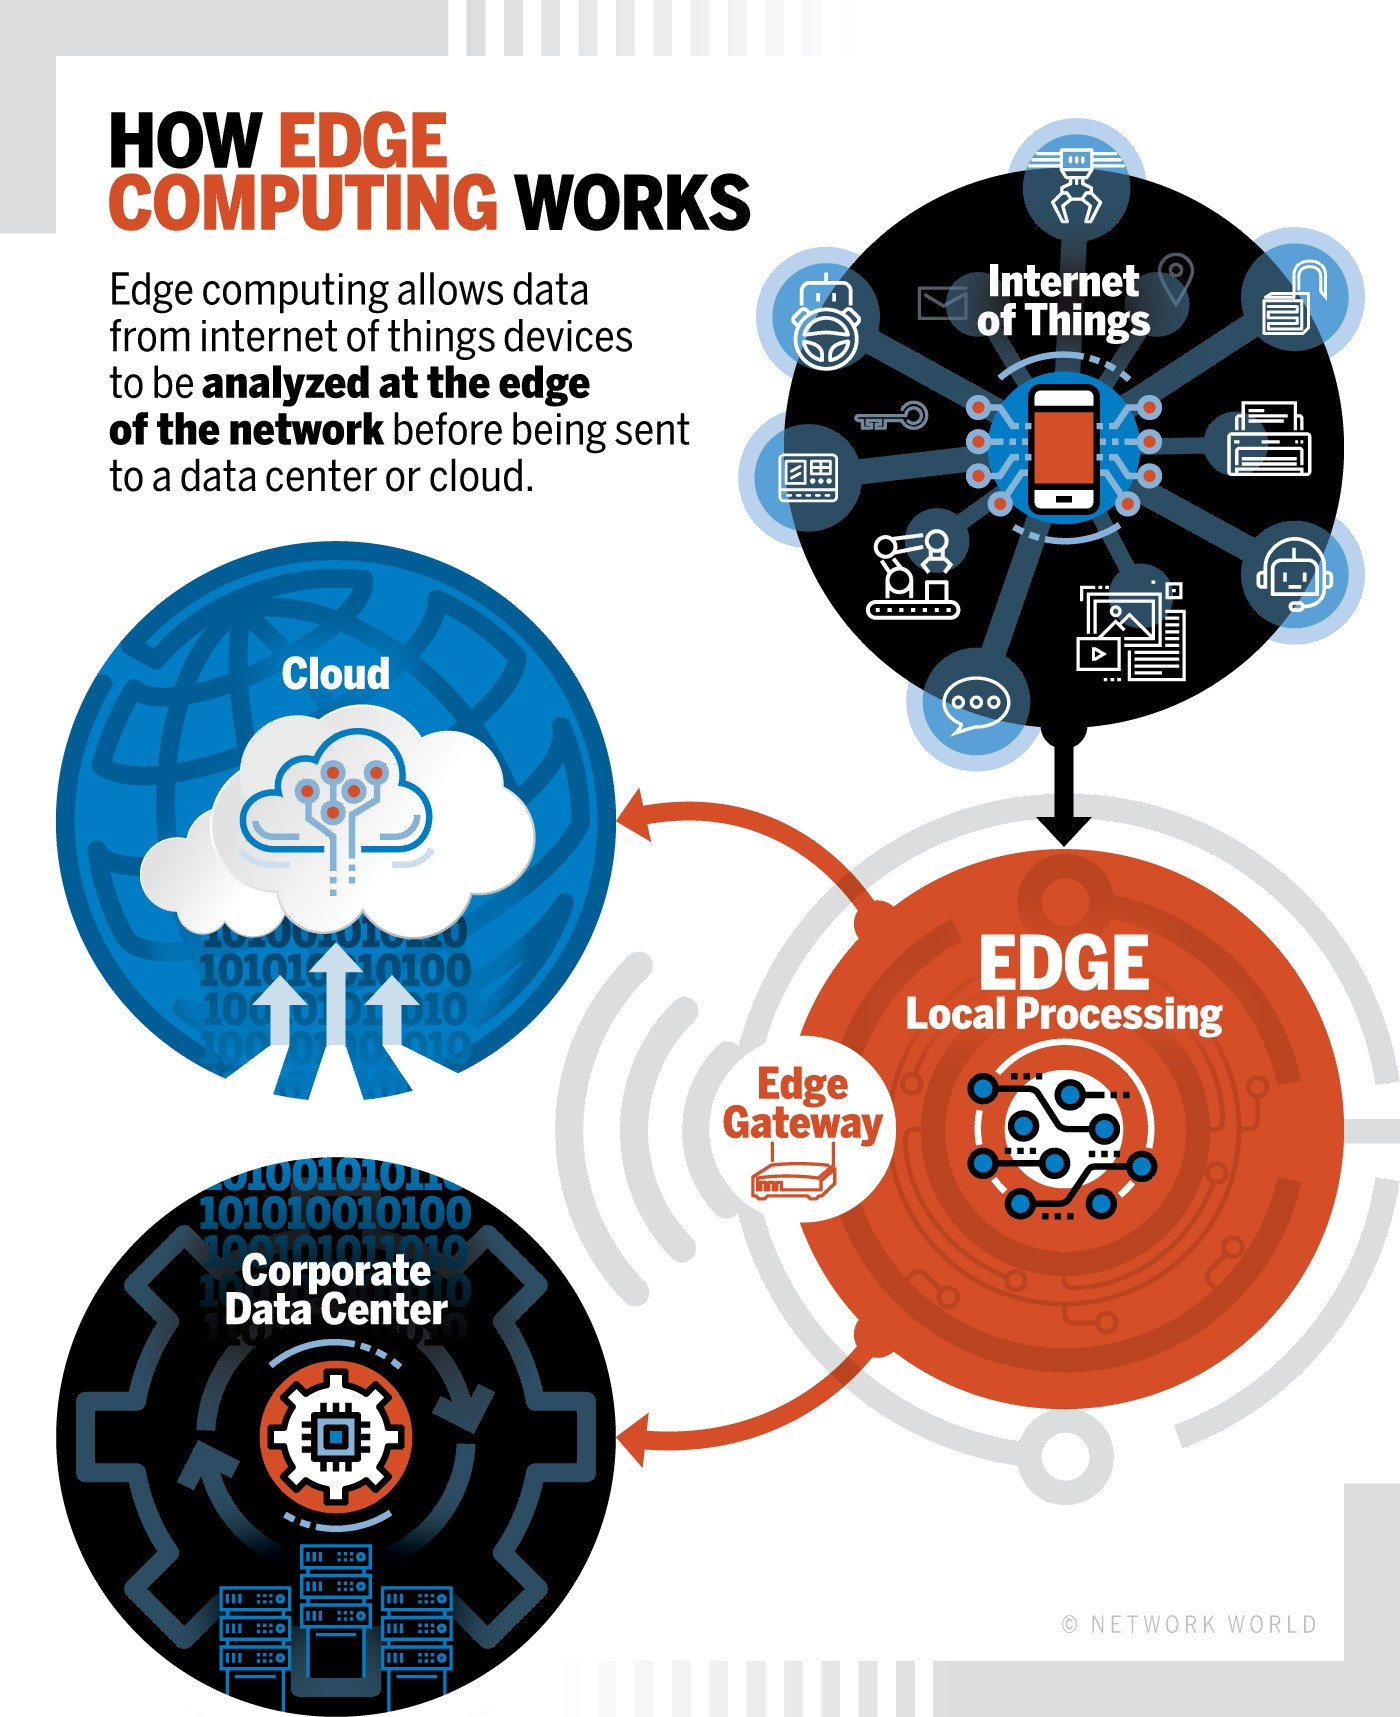 How does edge computing work?